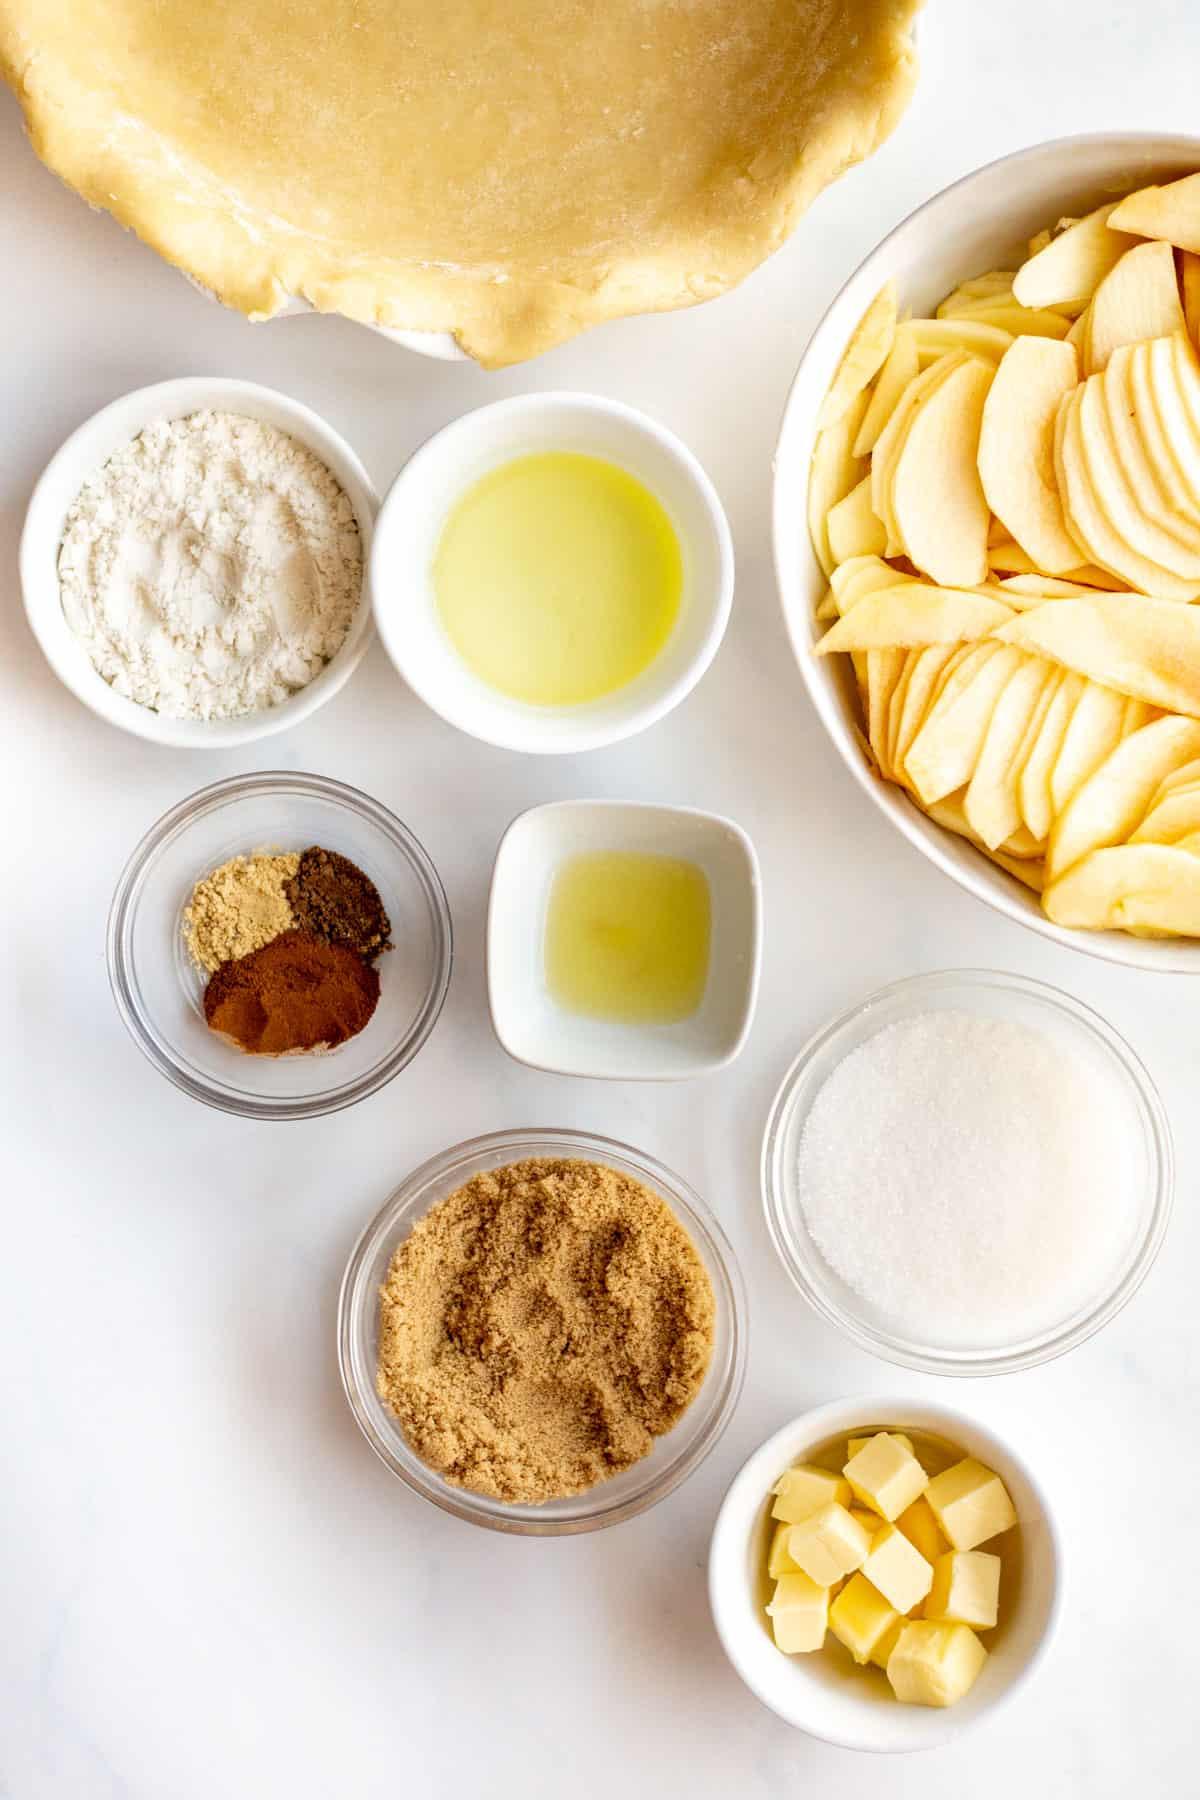 ingredients to make apple pie